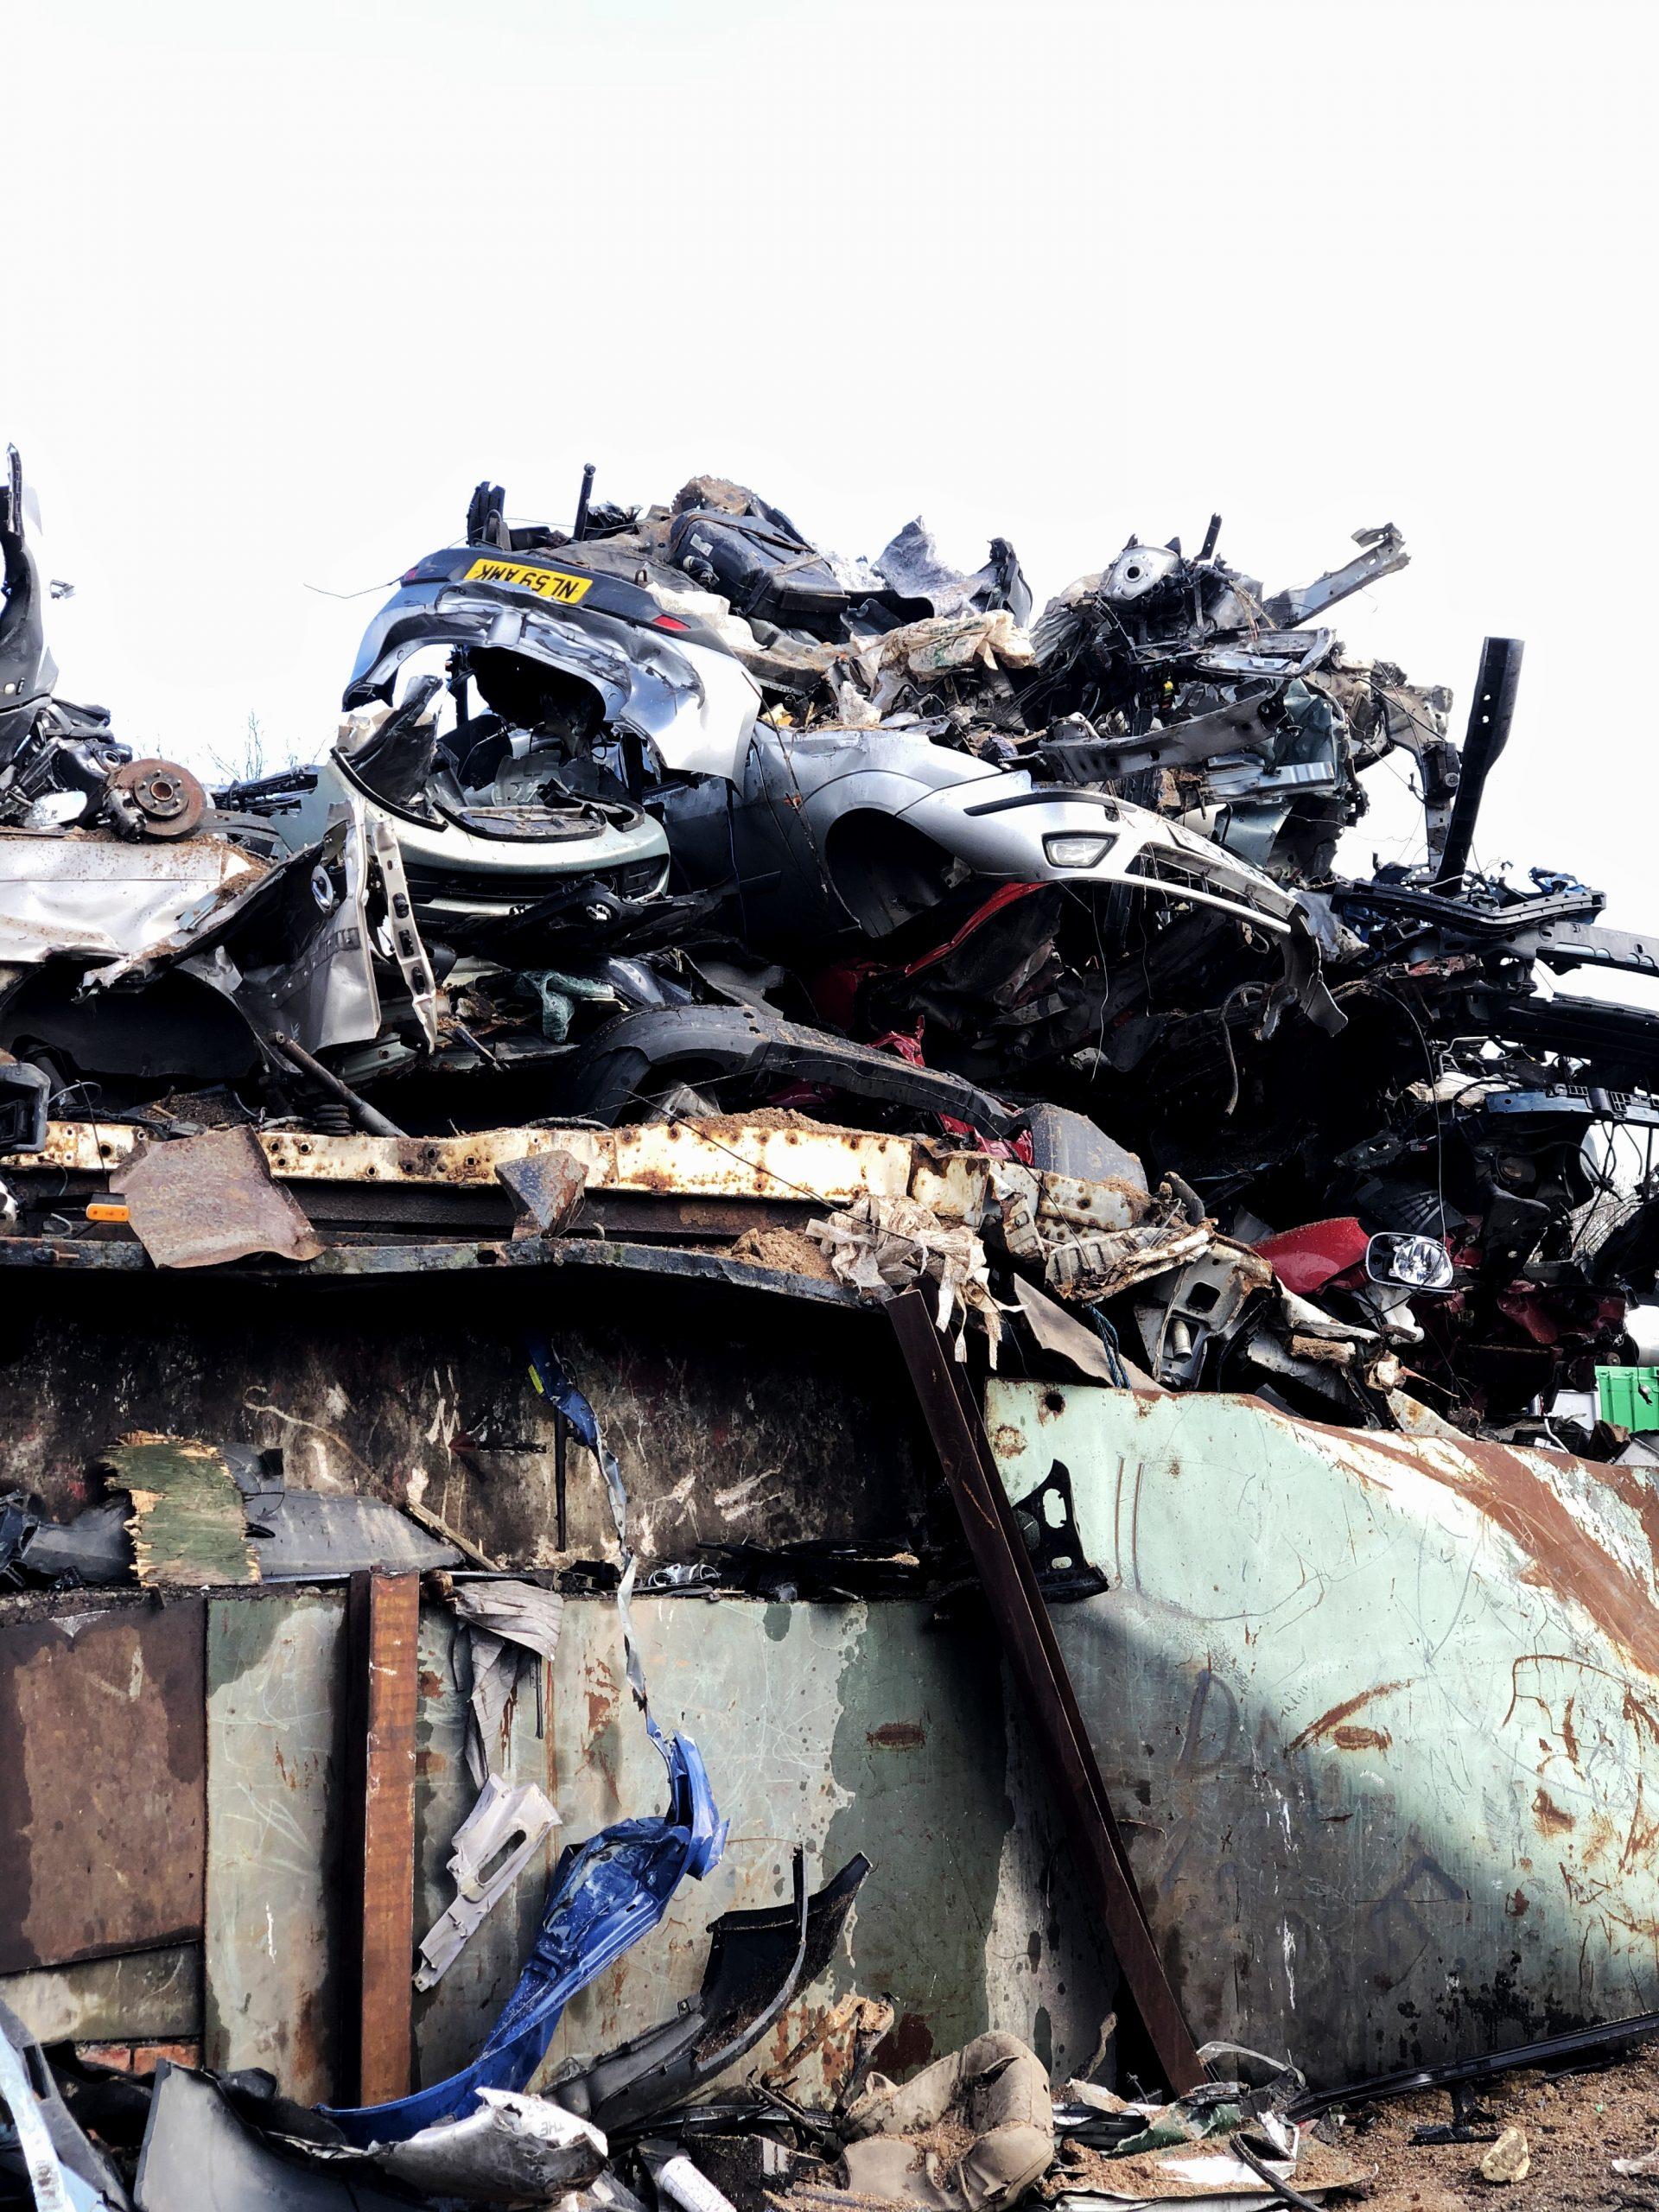 'Scrap my car near me' scrapmycars.co.uk